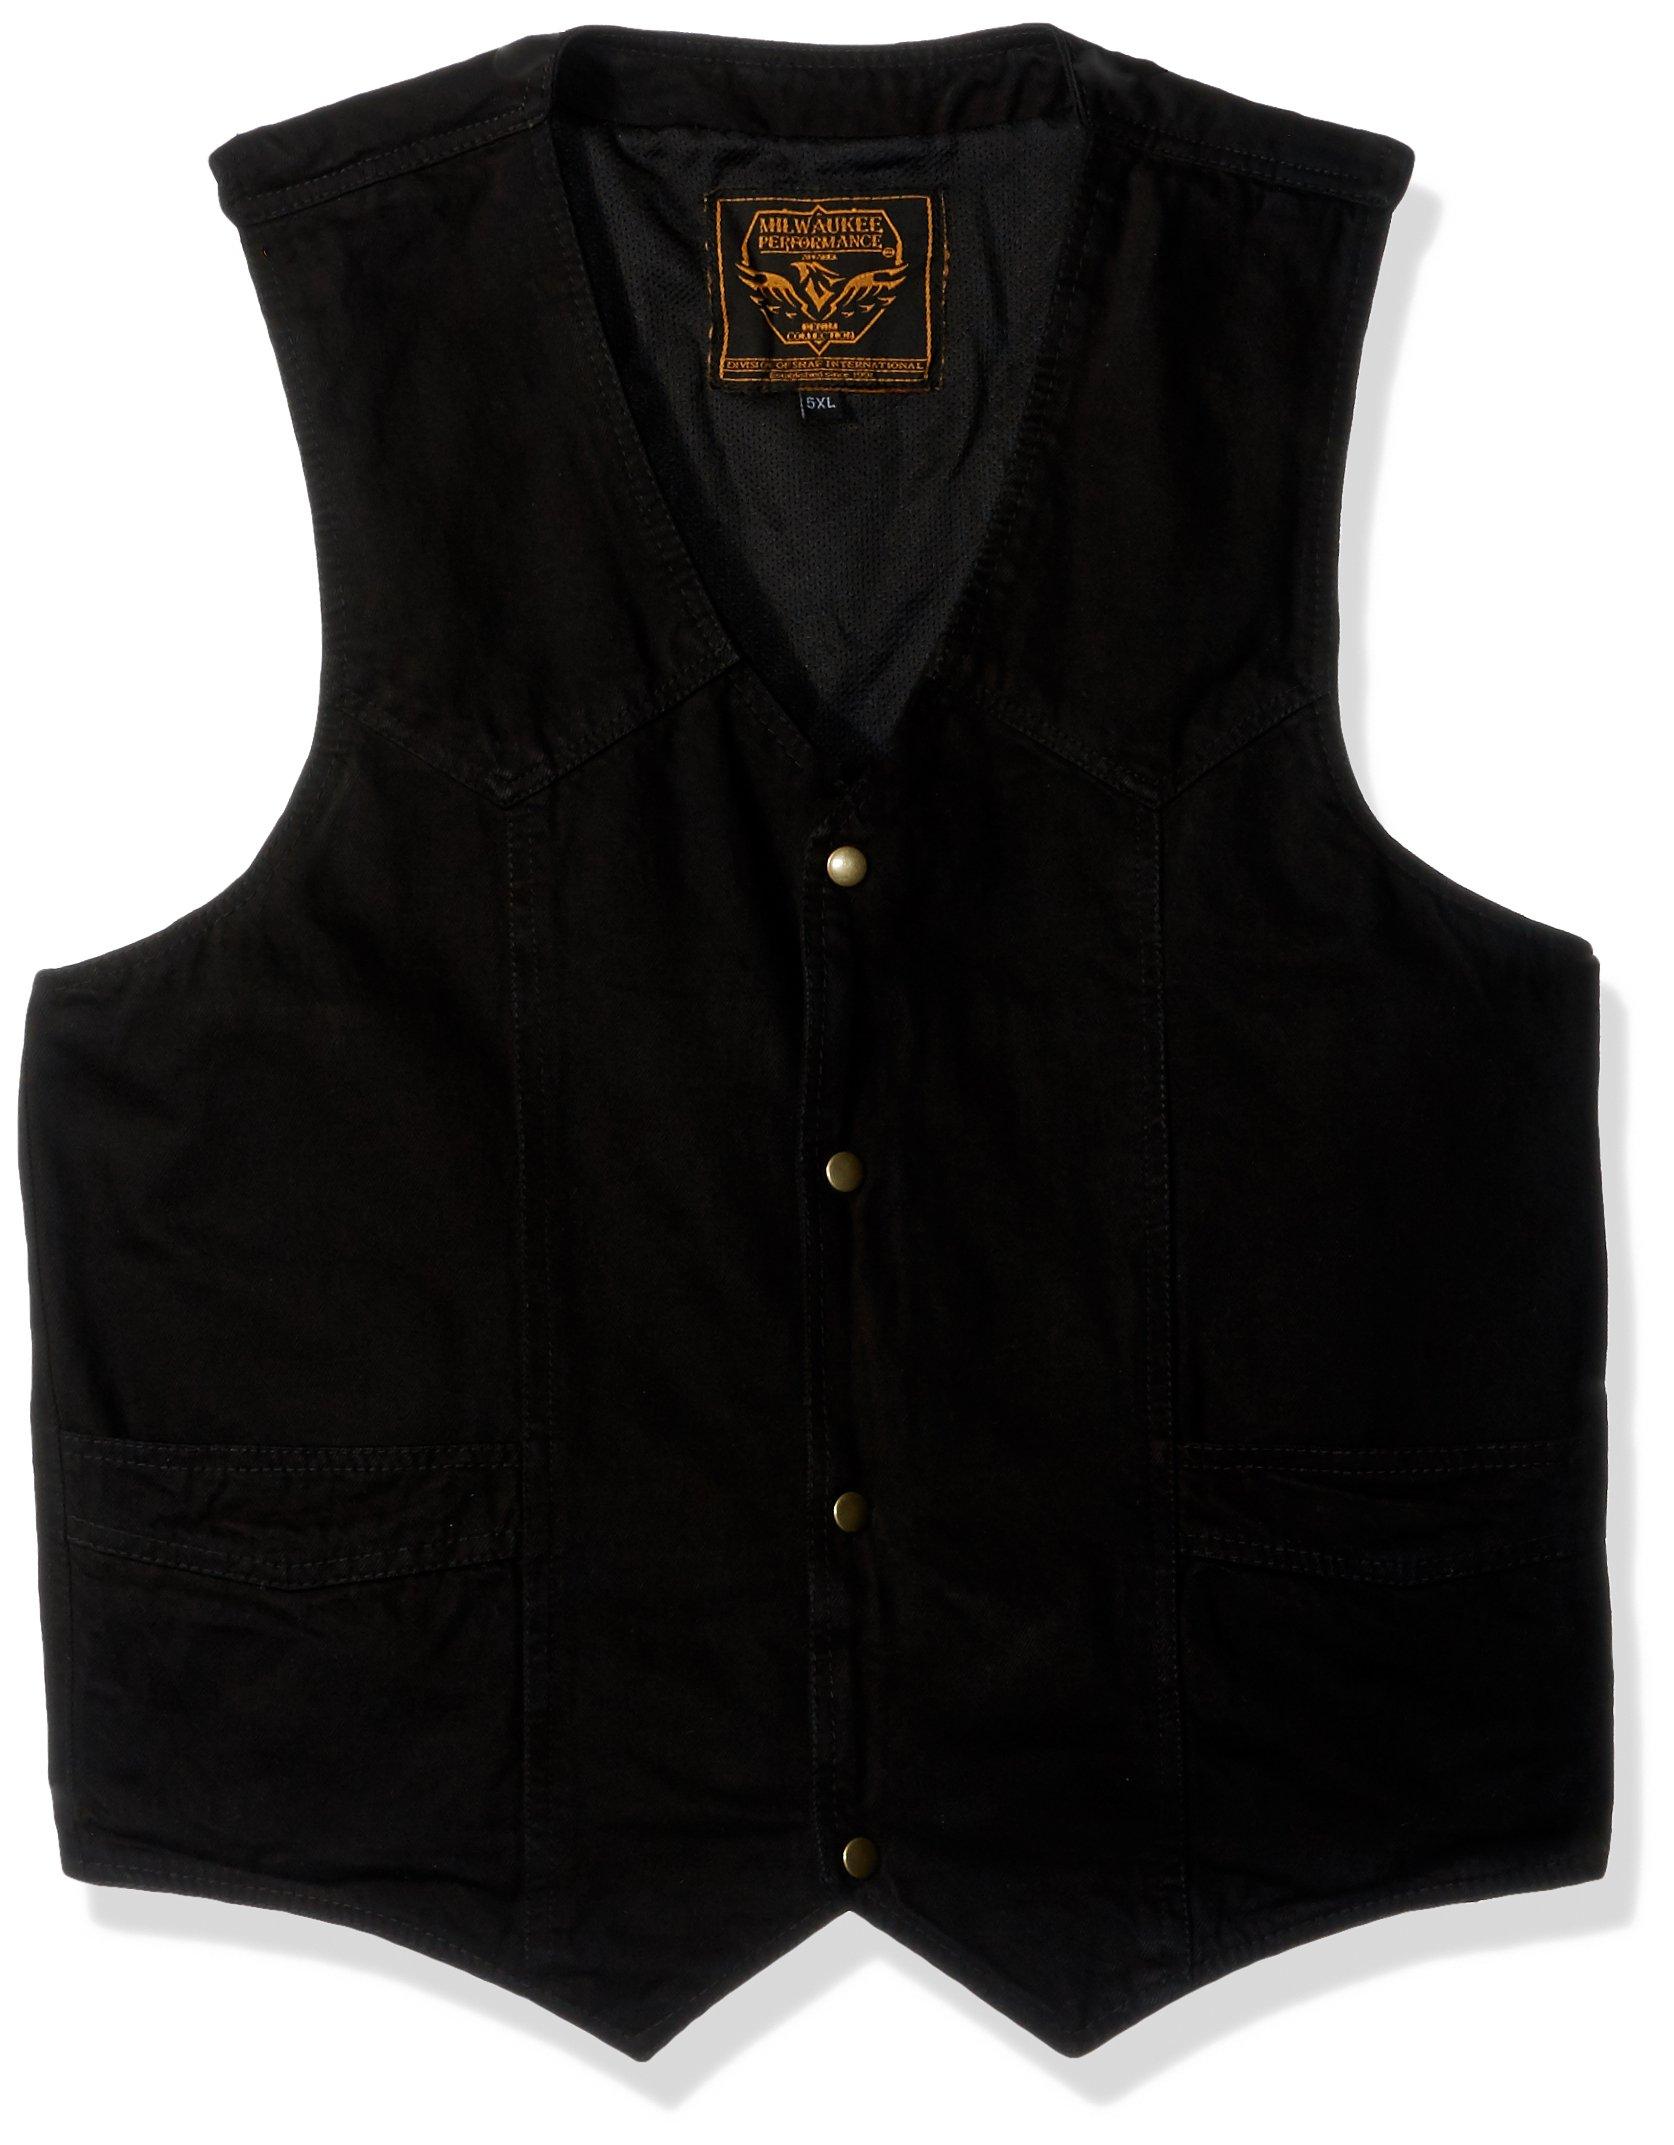 MILWAUKEE PERFORMANCE- Men's Plain Side Basic Denim Vest (Black, 5X-Large)